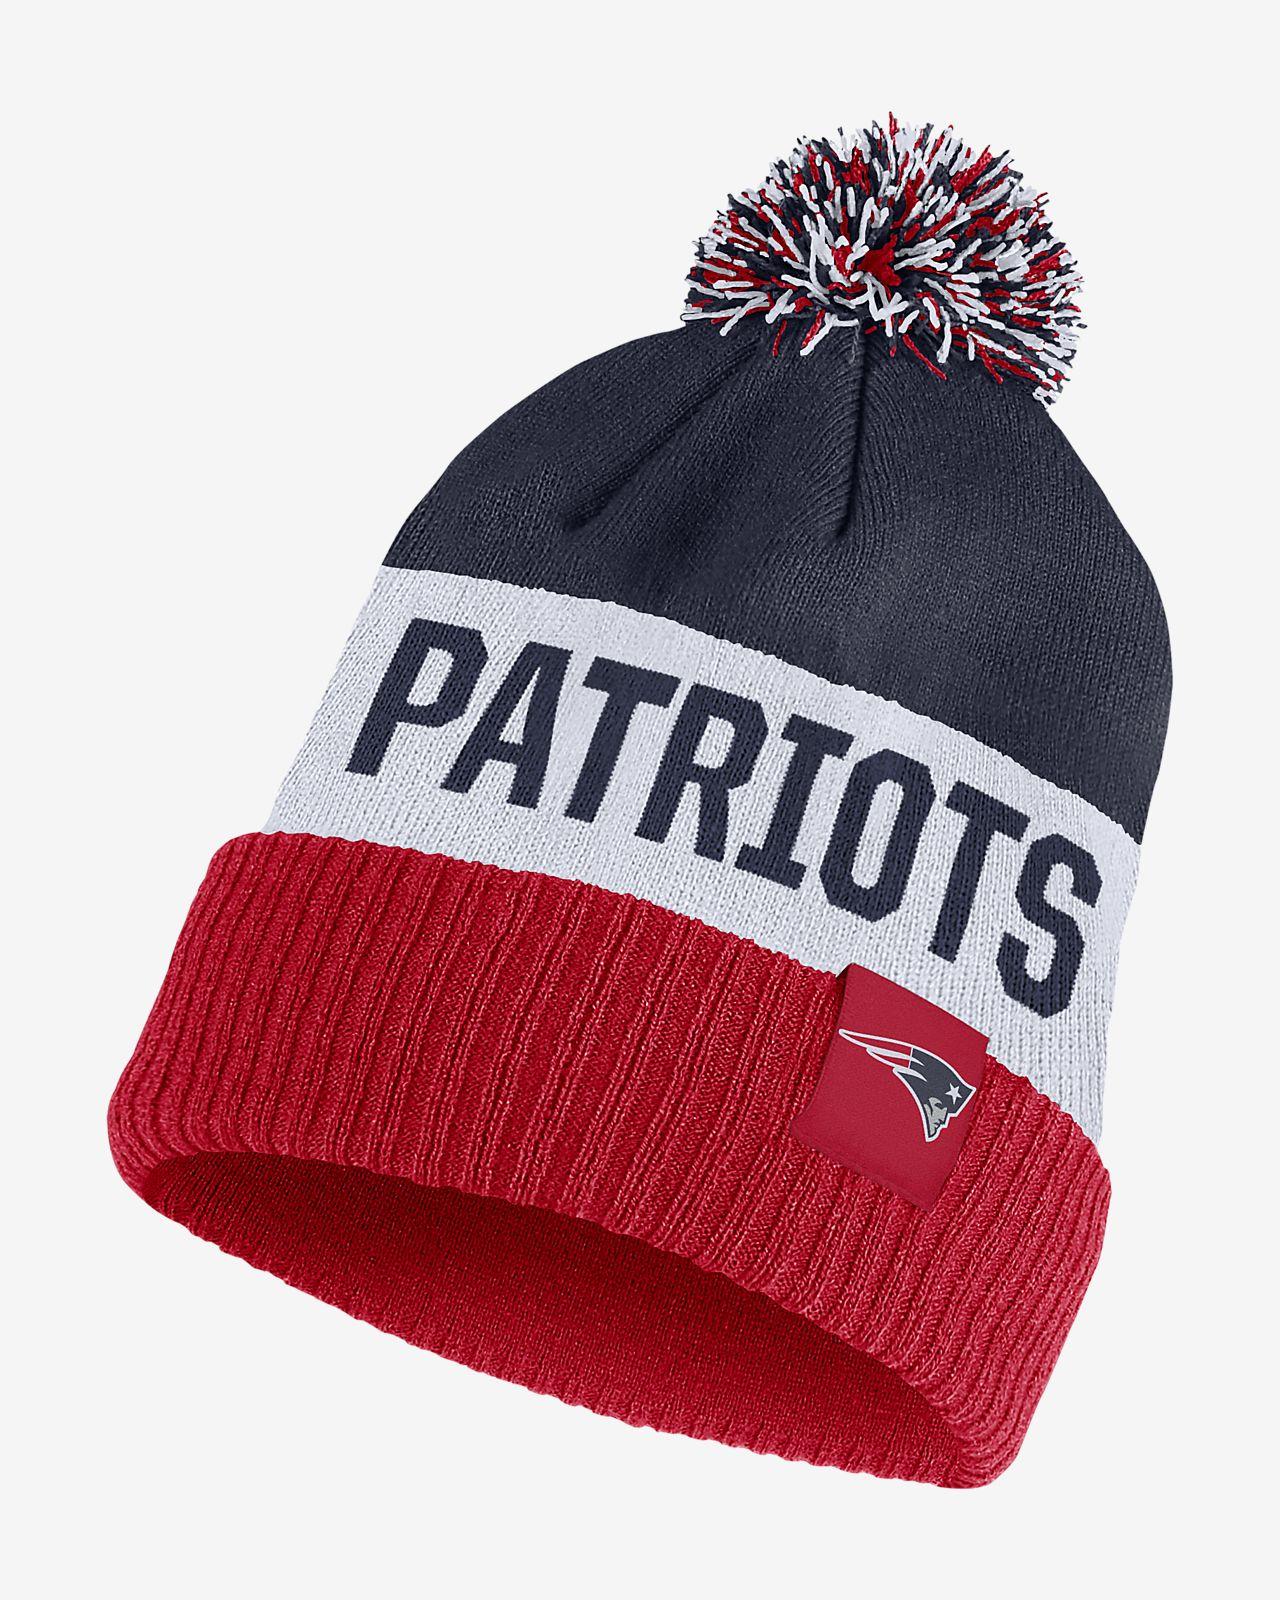 Nike (NFL Patriots) Beanie